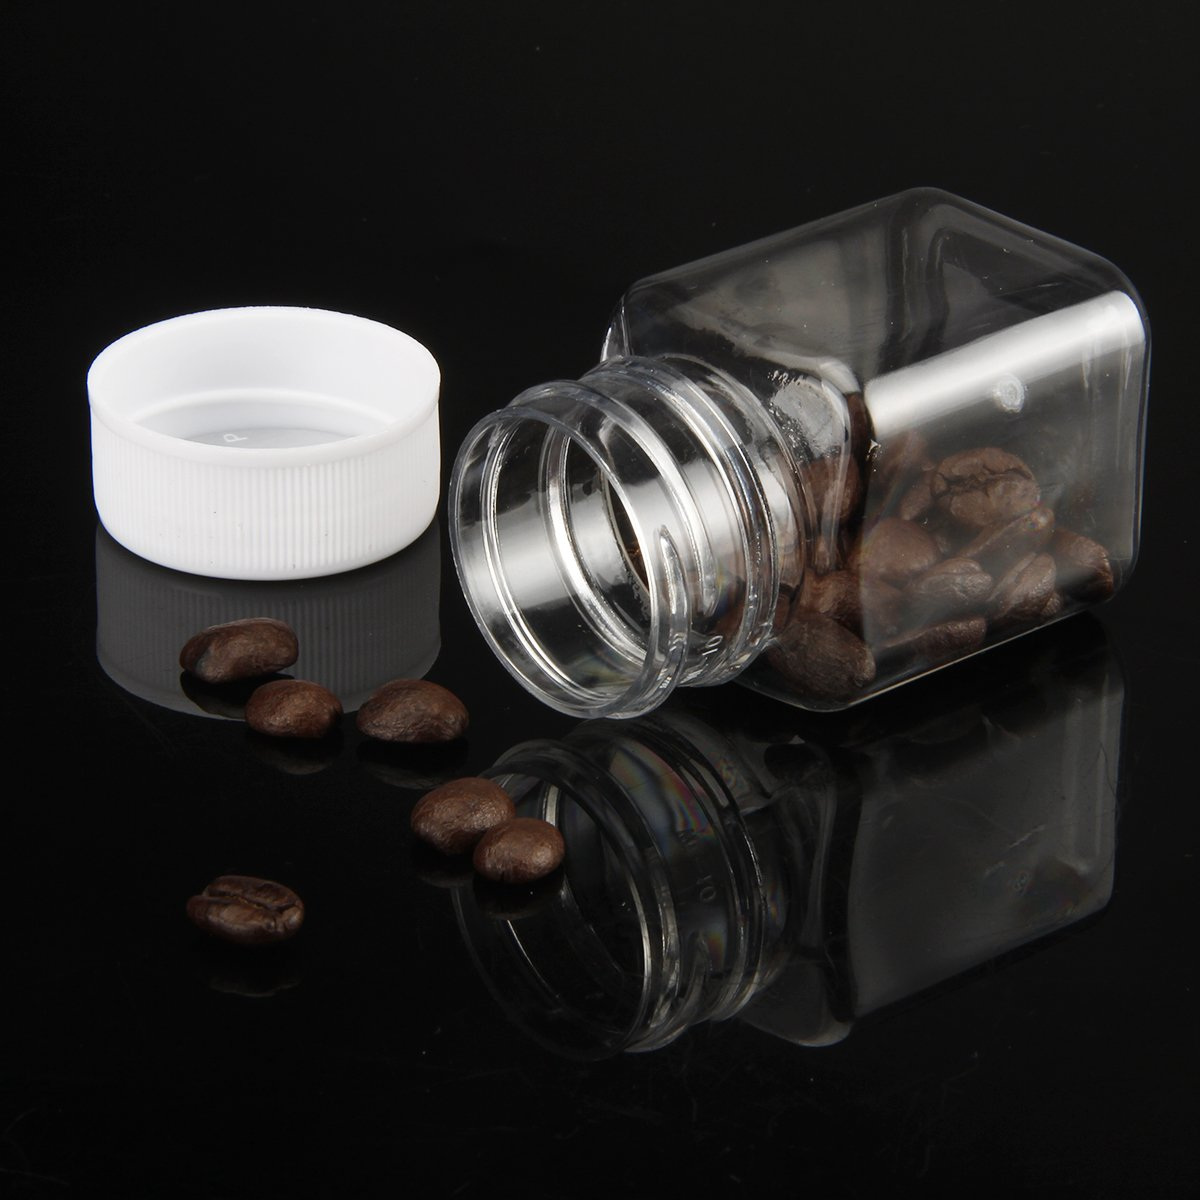 20pcs Eforstore Clear Plastic Bottles with Lids 60ml,20//50//100pcs Clear Empty Bottles Mini Clear Storage C